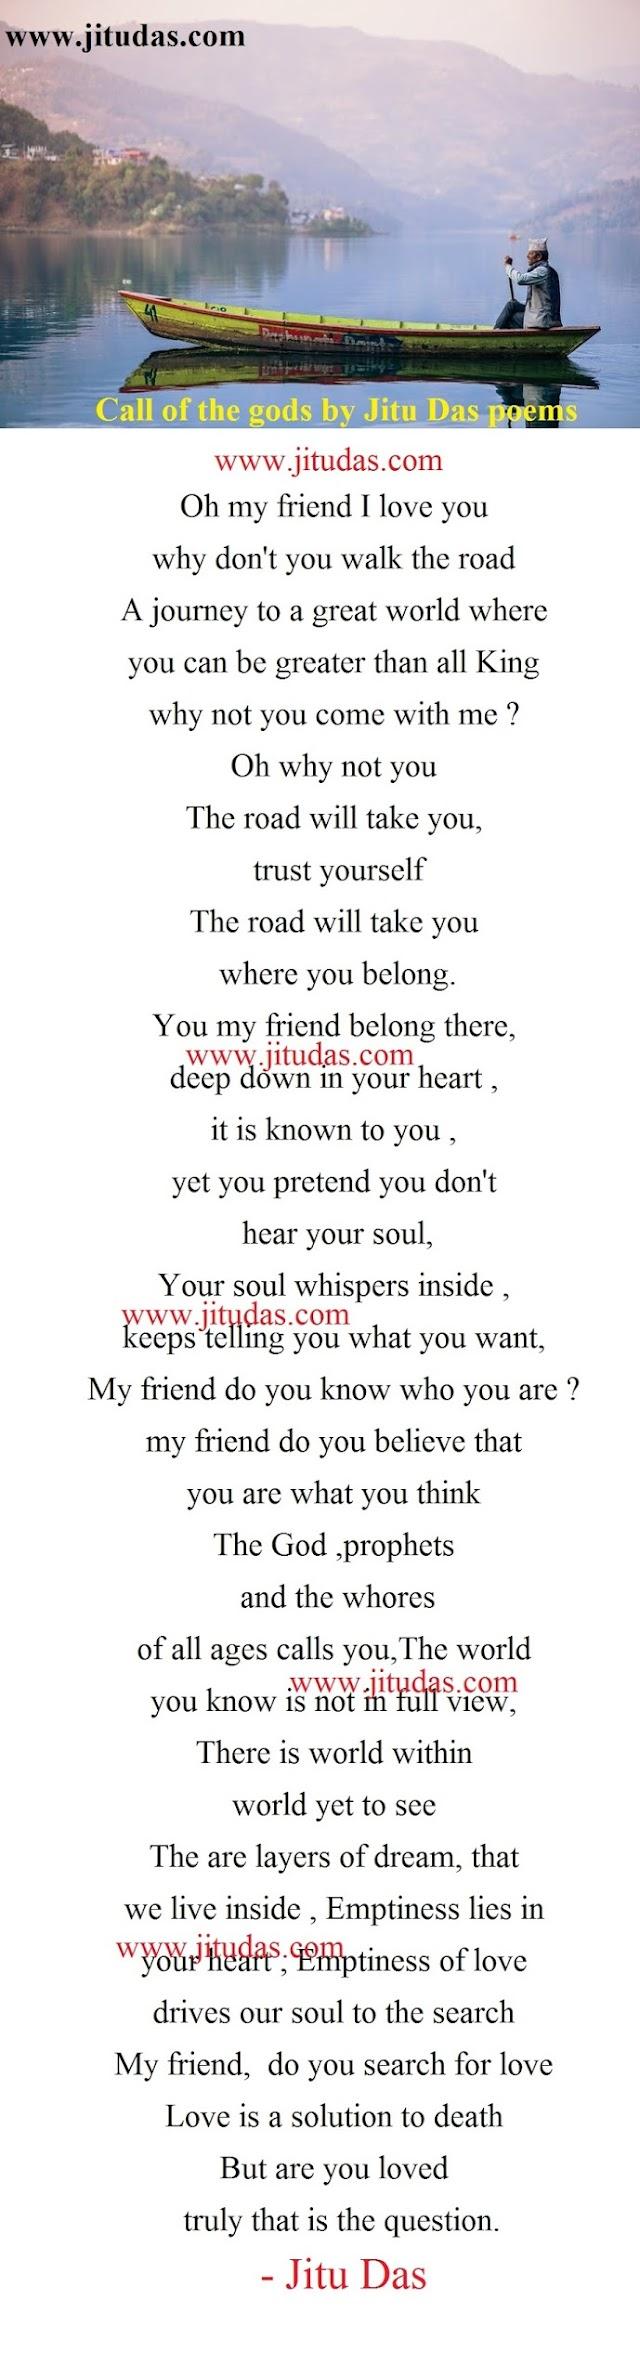 Deep life poems, Call of the gods poem by Jitu Das english poems